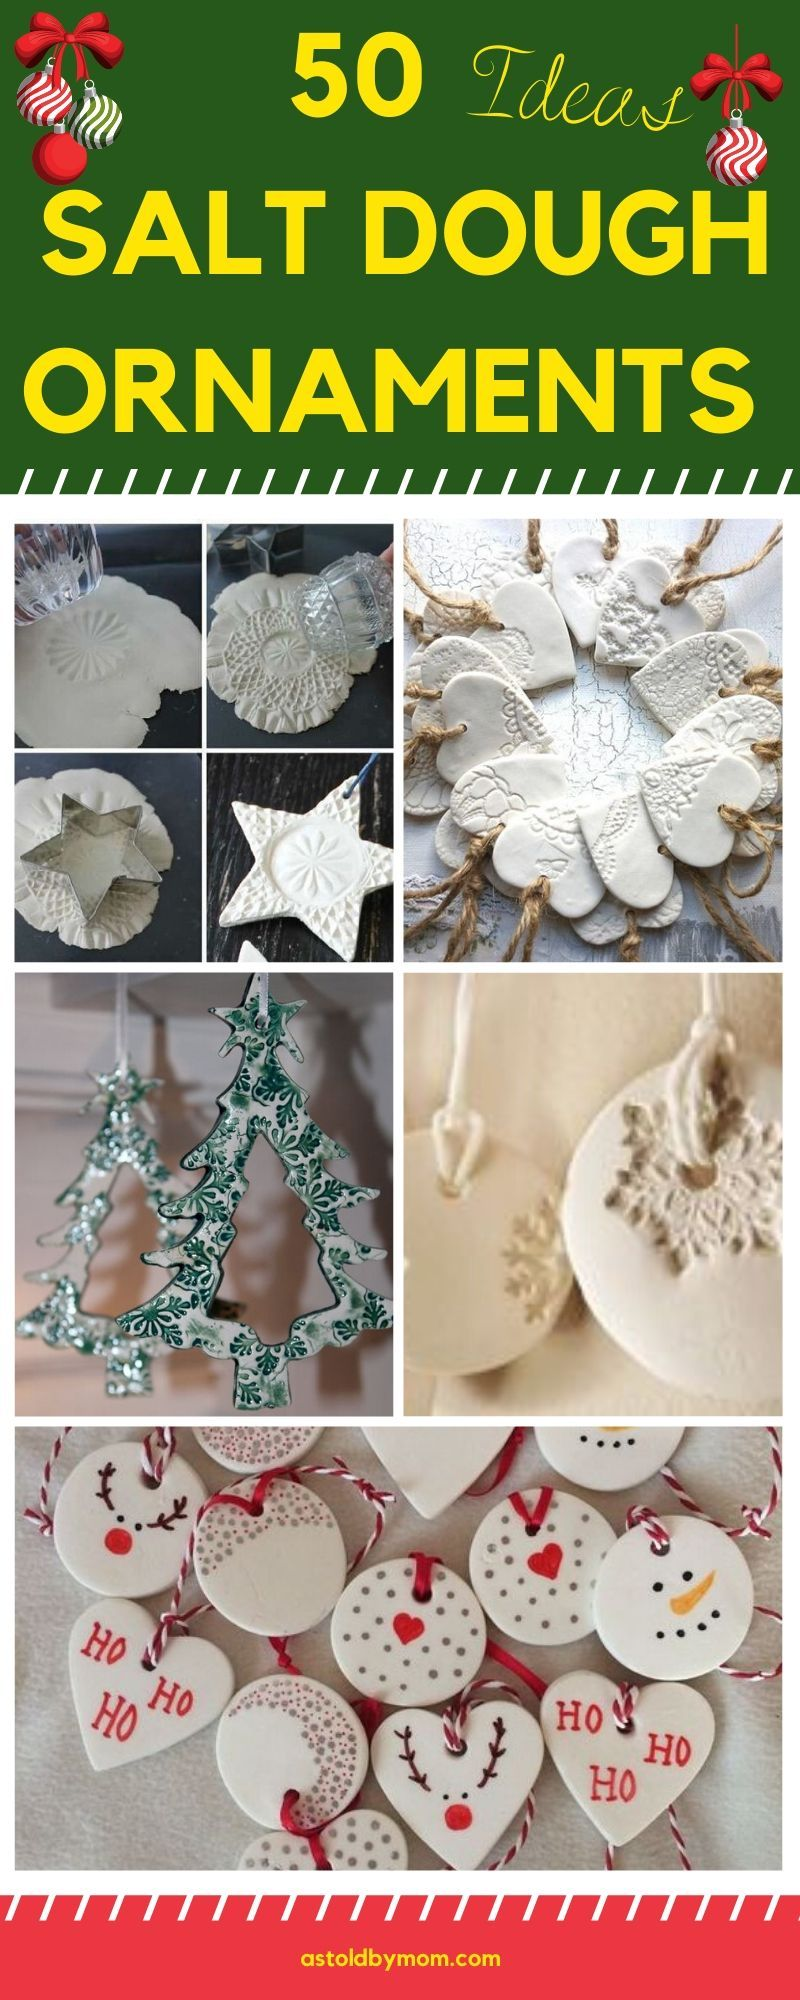 50 Salt Dough Ornaments Christmas Decorations As Told By Mom Salt Dough Christmas Ornaments Cheap Christmas Ornaments Cheap Christmas Crafts